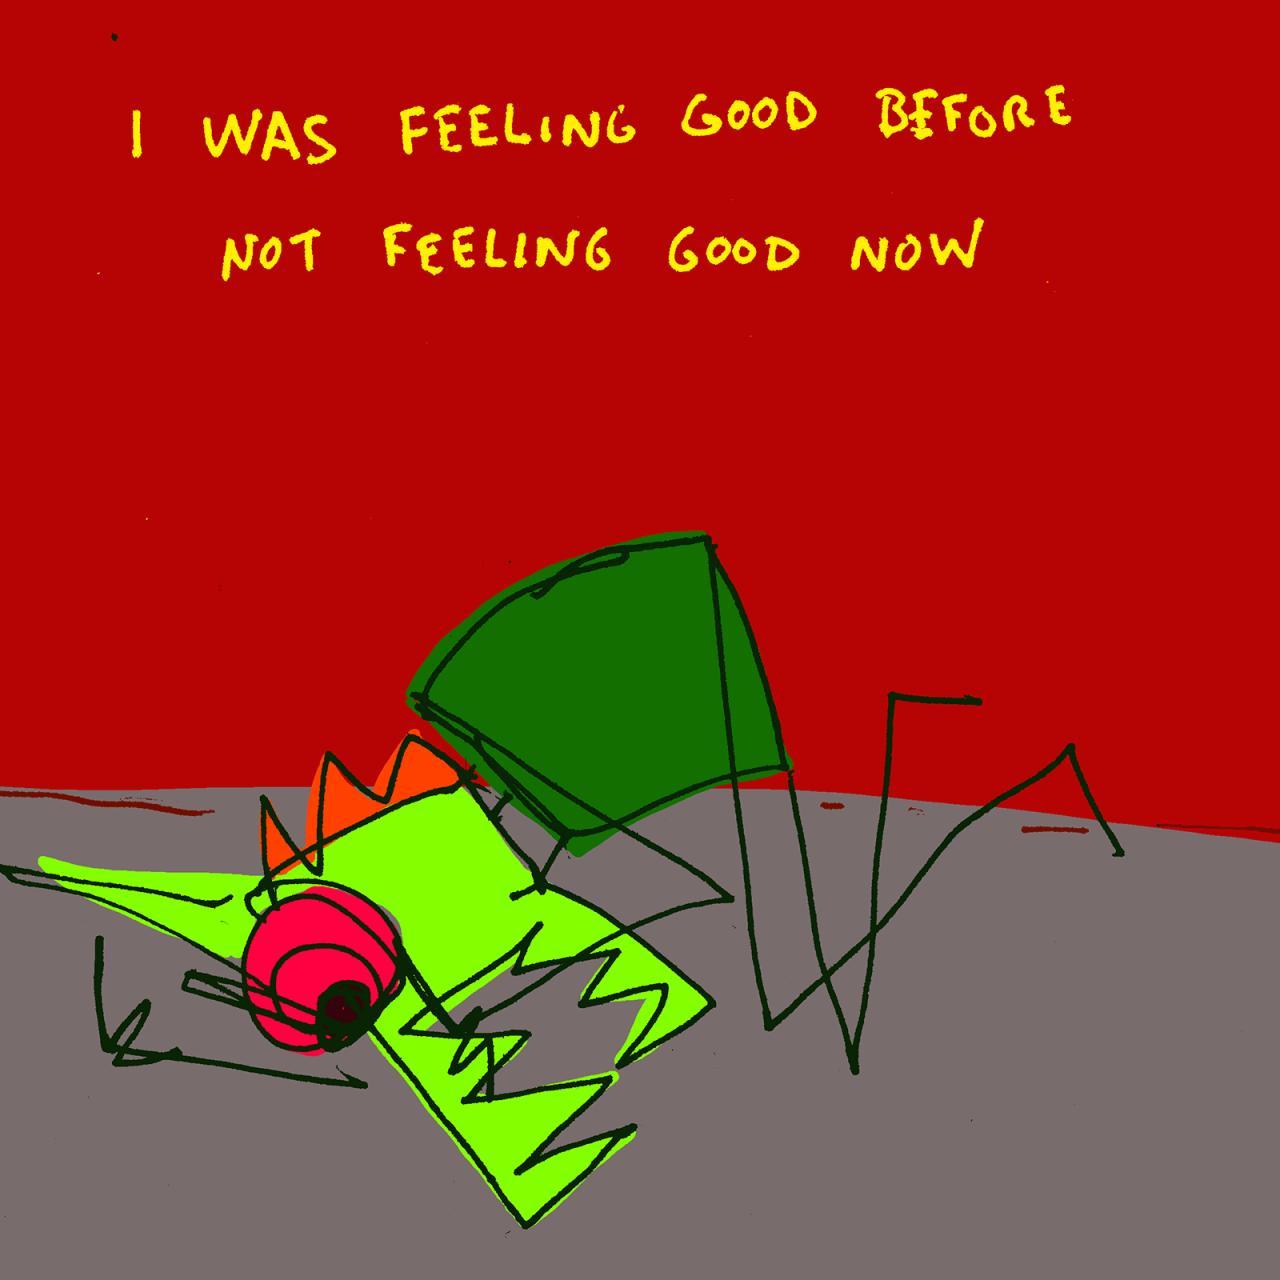 Crazy Monster is not feeling good.